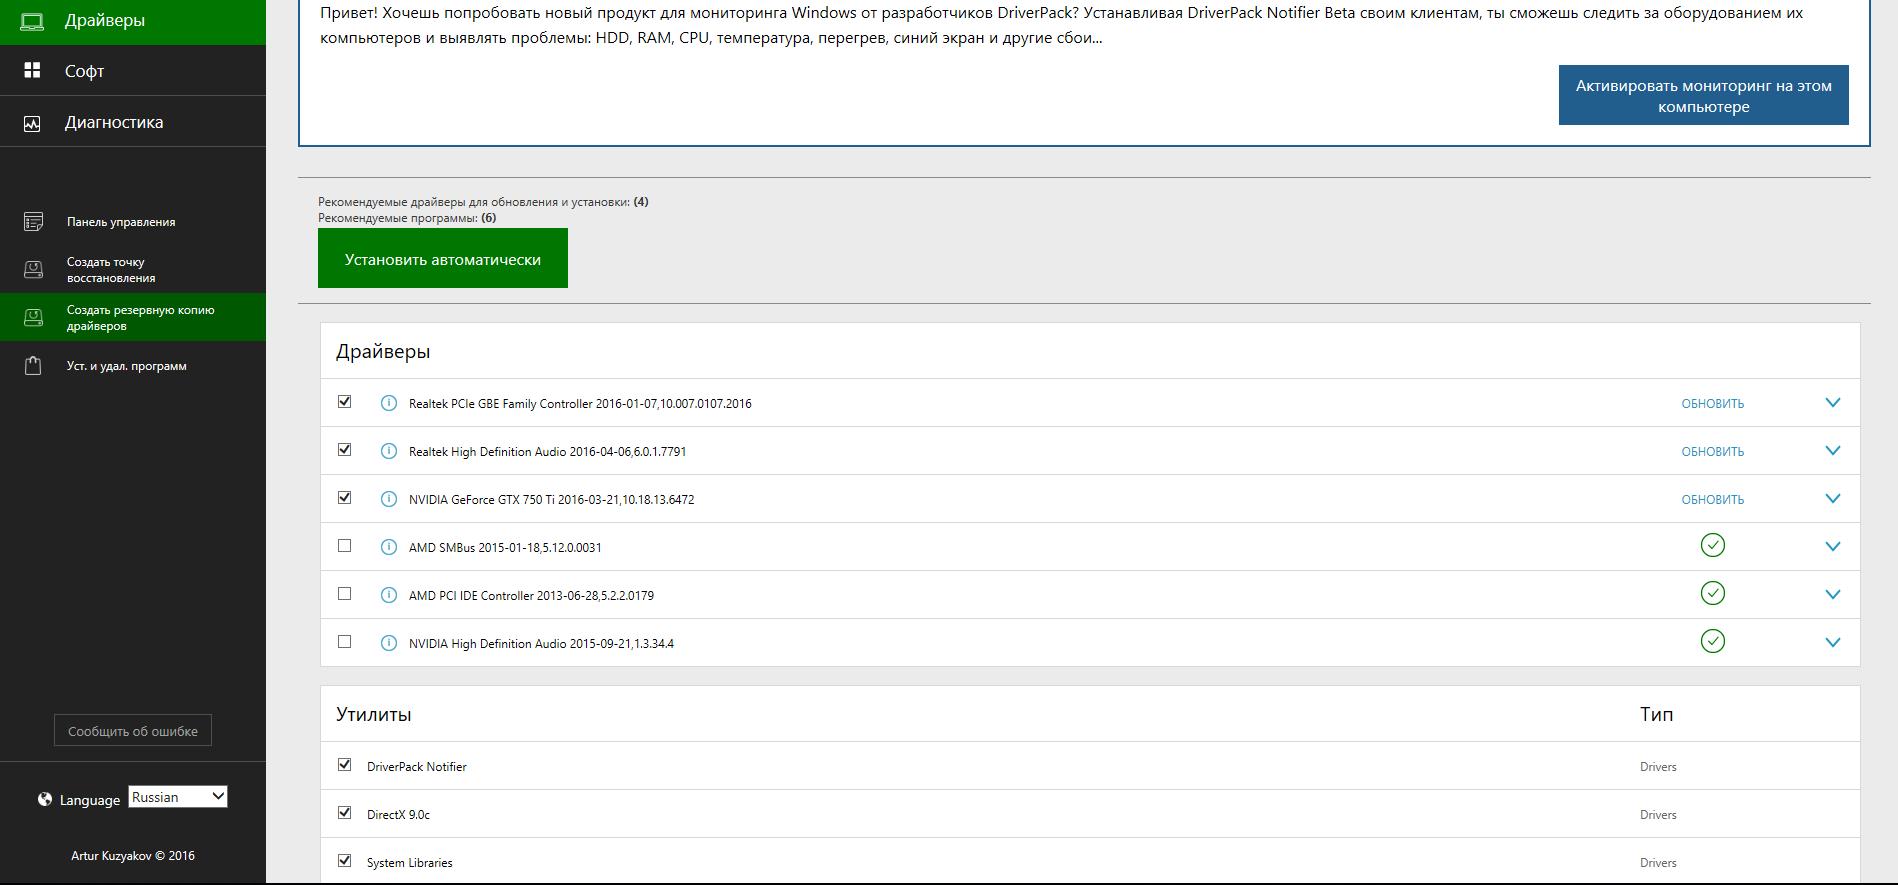 драйвер usb 3.0 для windows 10